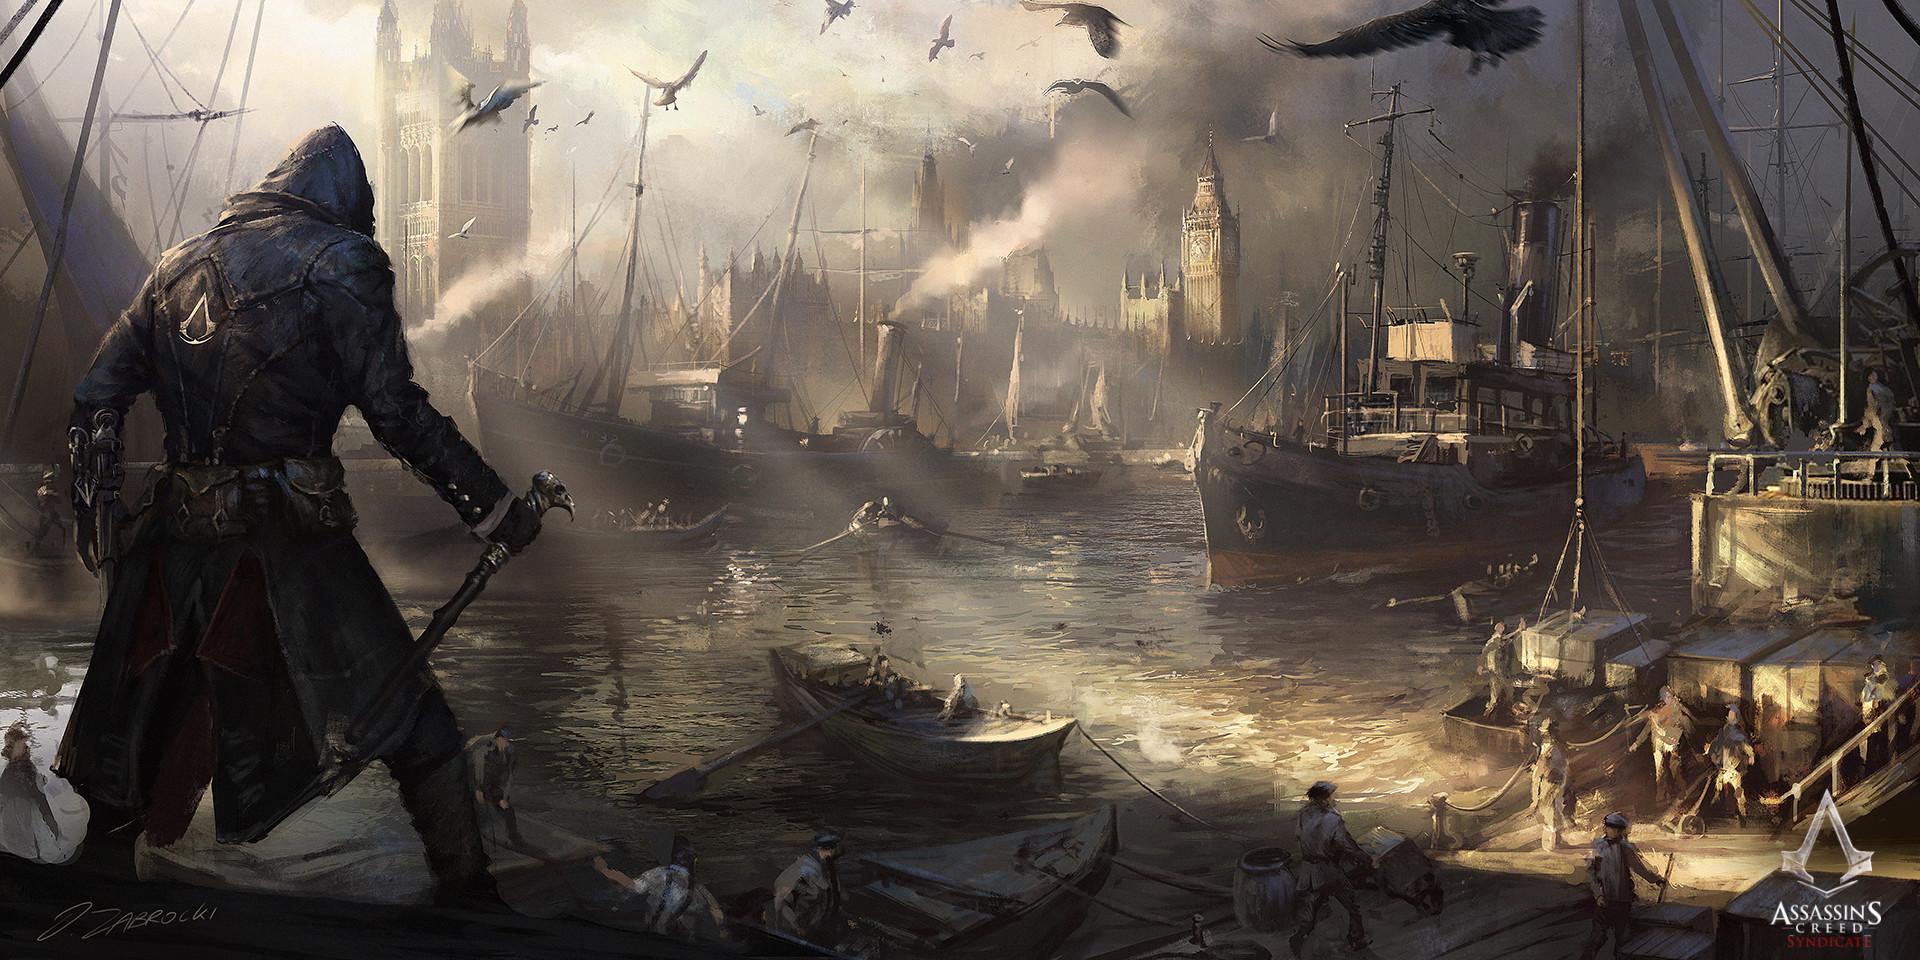 darek-zabrocki-westminster-river-final-ac-syndicate-darekzabrocki.jpg